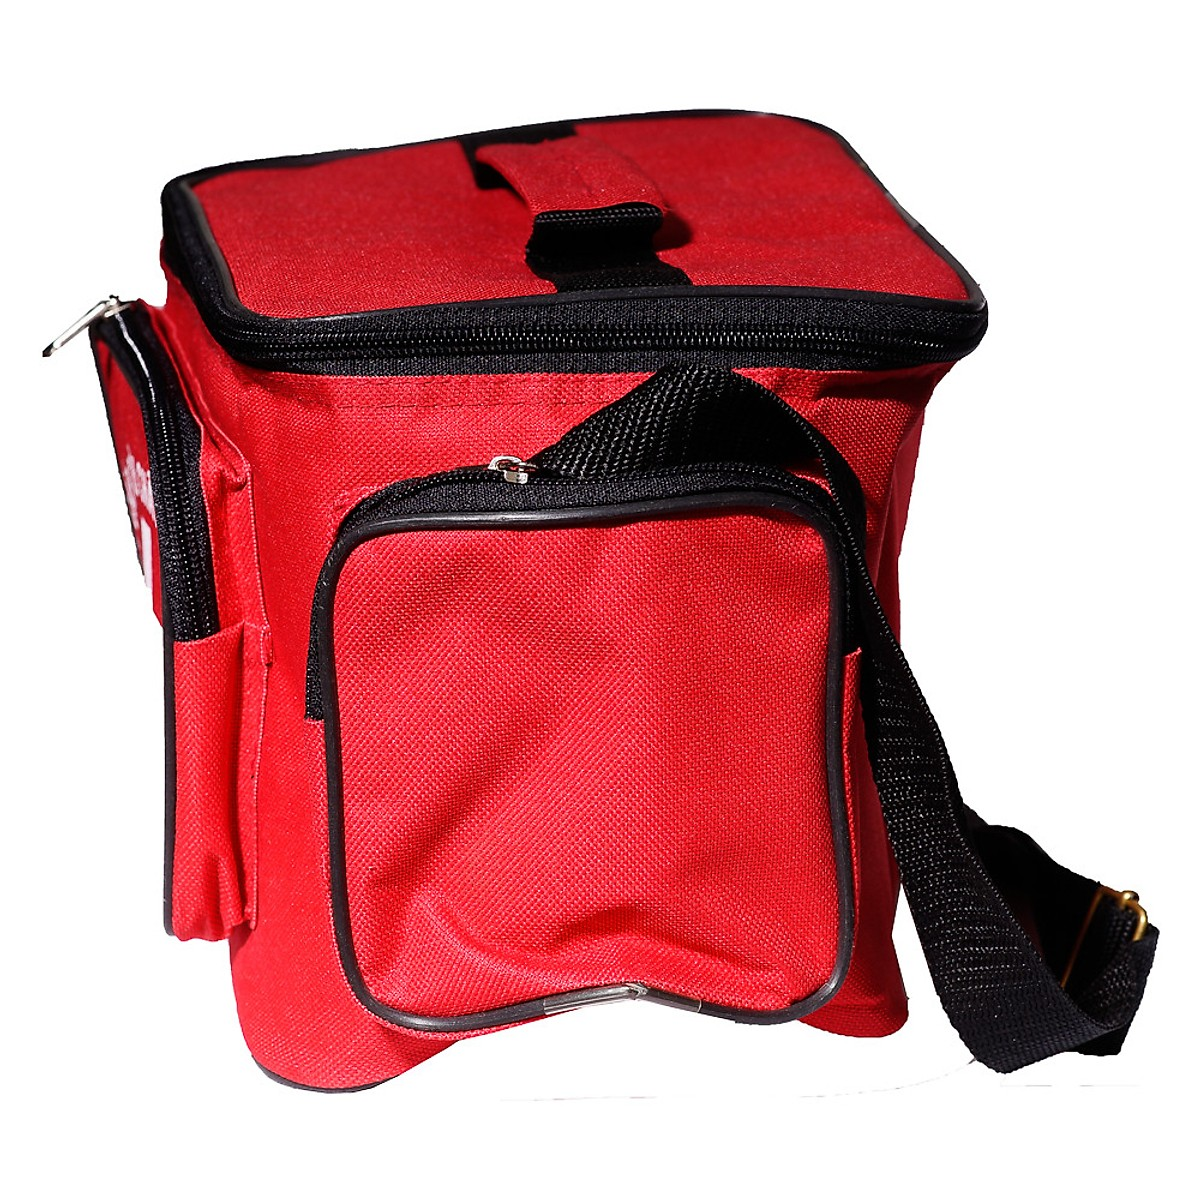 Túi y tế đỏ size M